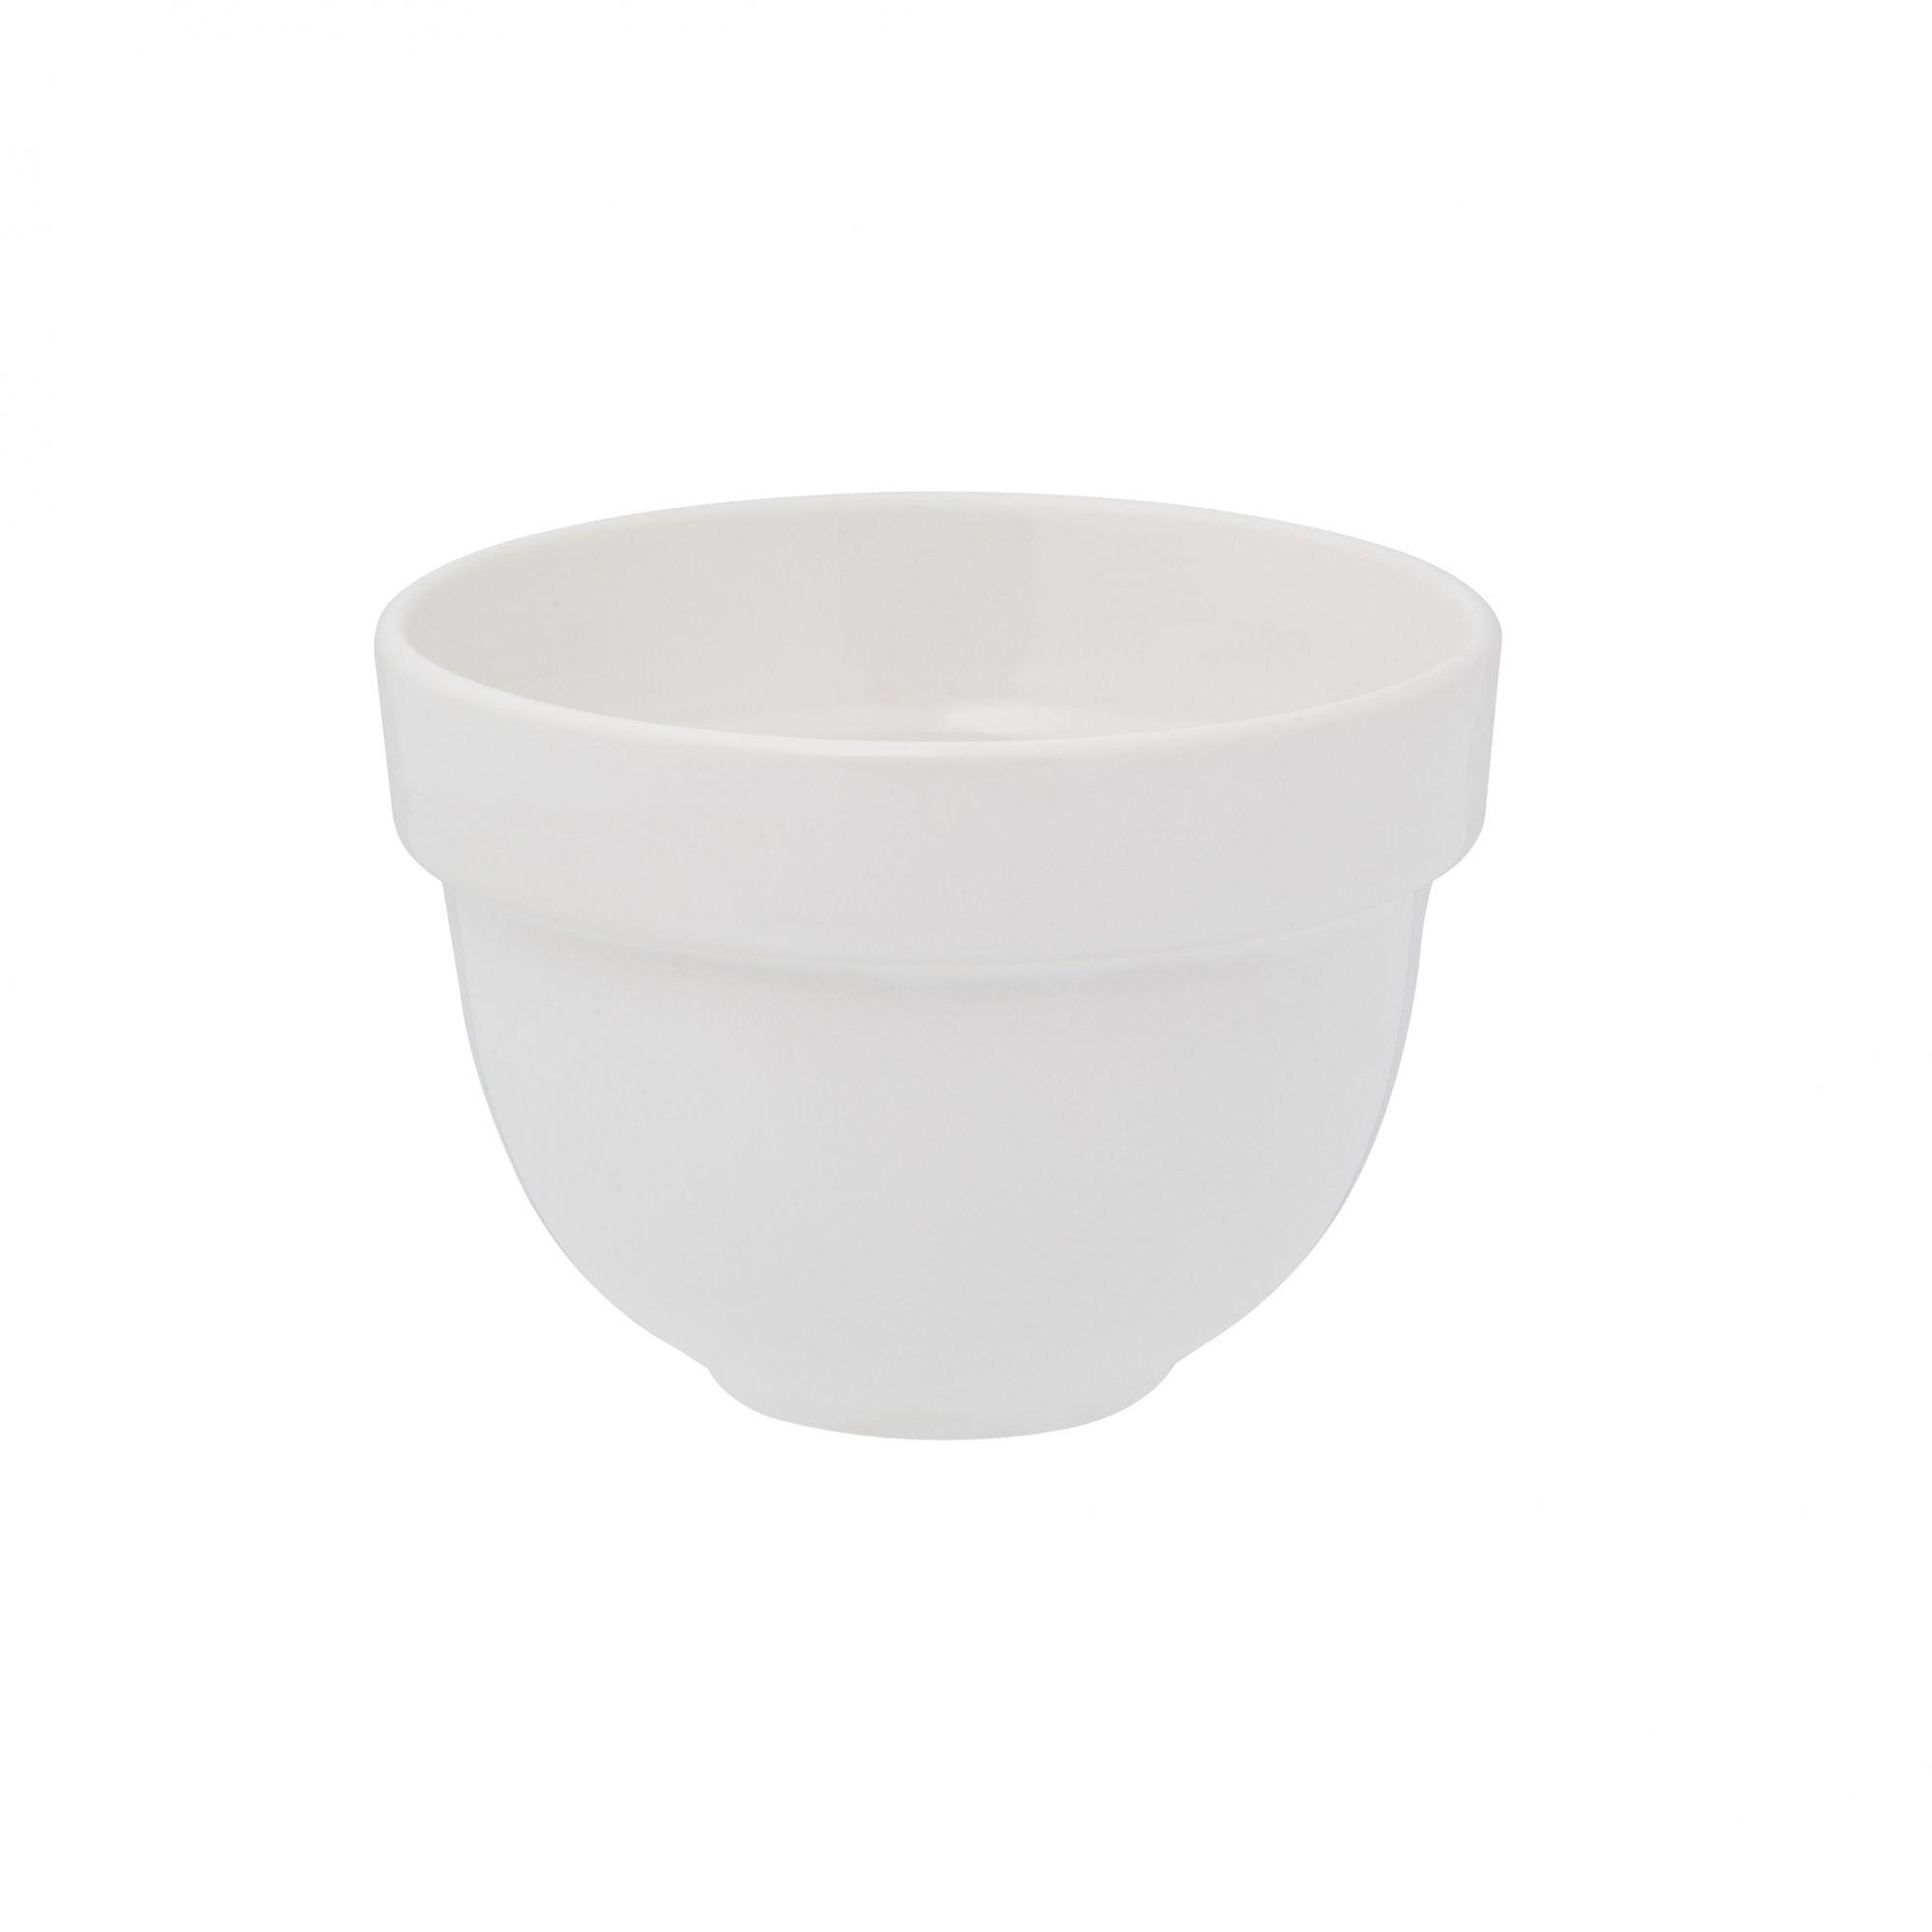 Tigela para Mistura Pequena 16 cm Branca